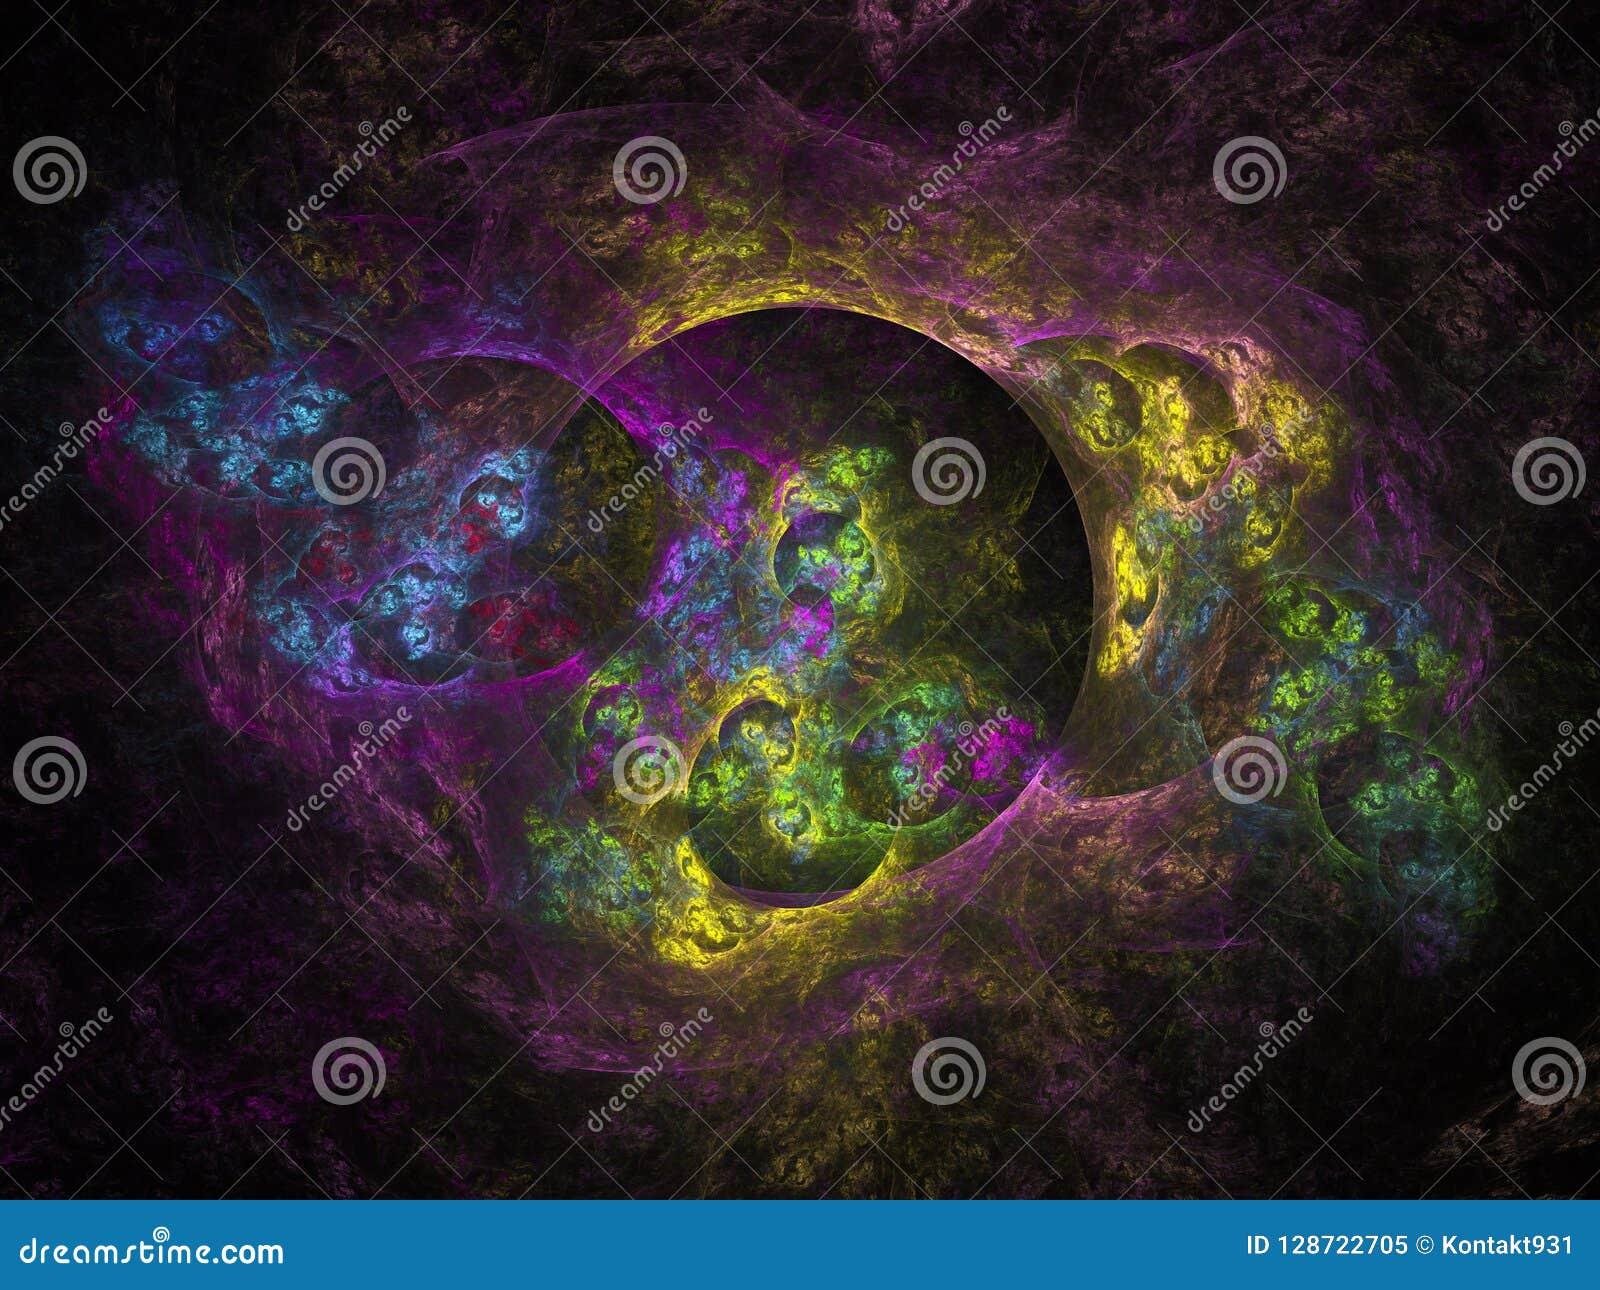 Surreal Futuristic Digital 3d Design Art Abstract Background Fractal